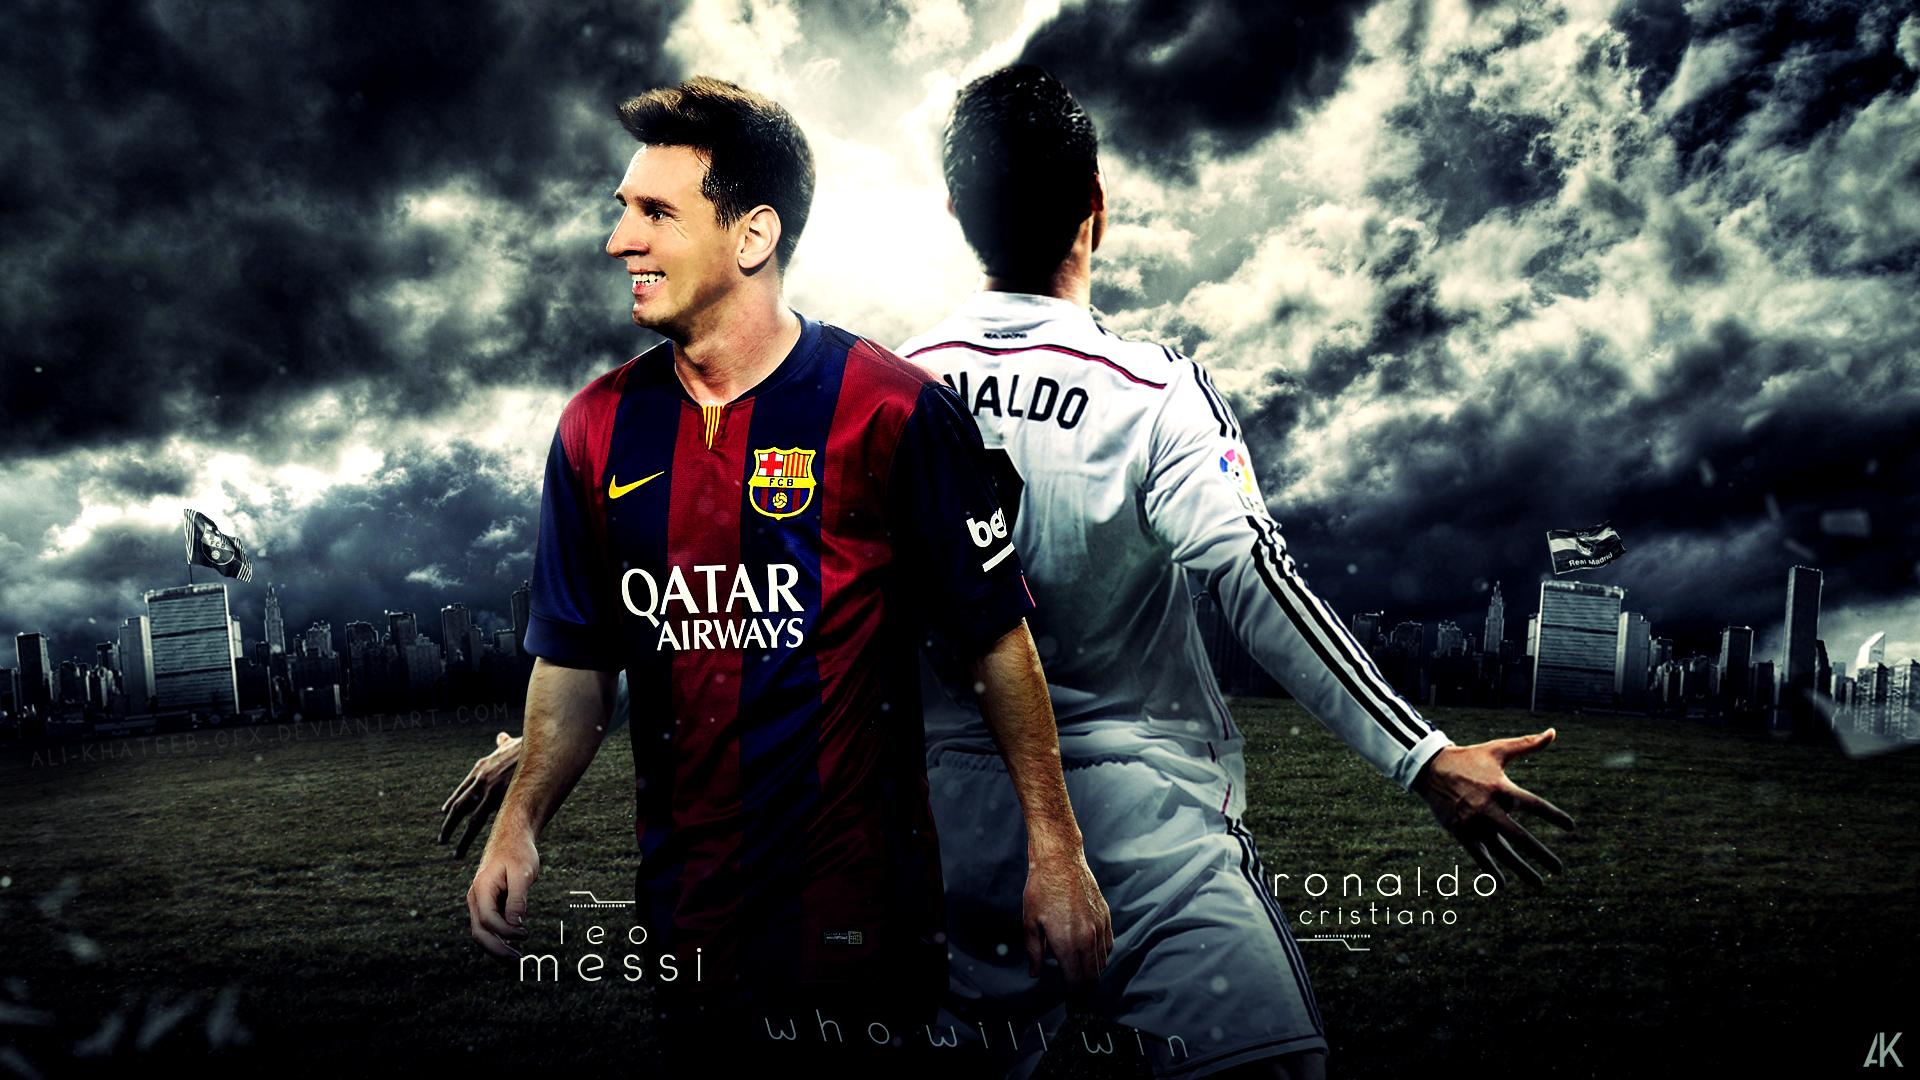 Cristiano Ronaldo And Leo Messi By Ali Khateeb Gfx On Deviantart